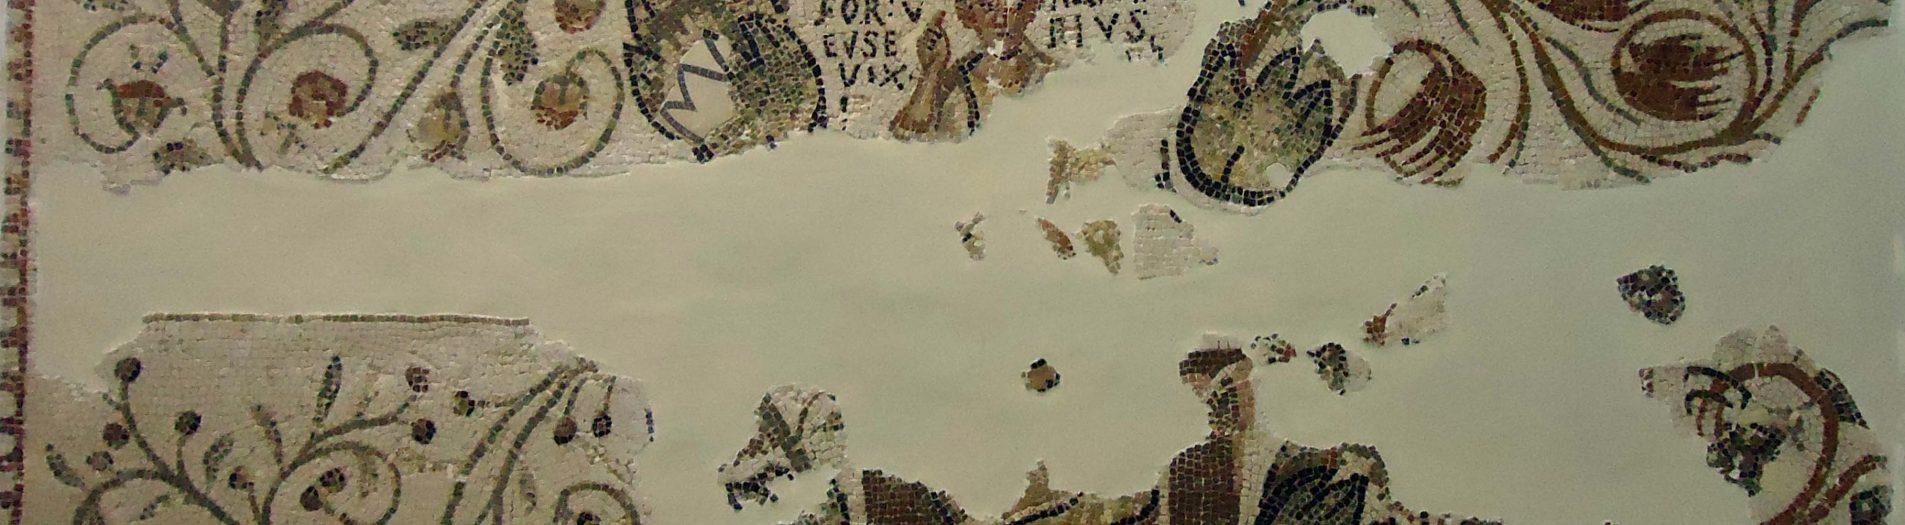 La Mosaïque funéraire de l'enfant Papirius Fortunatianus Eusobius de Dougga